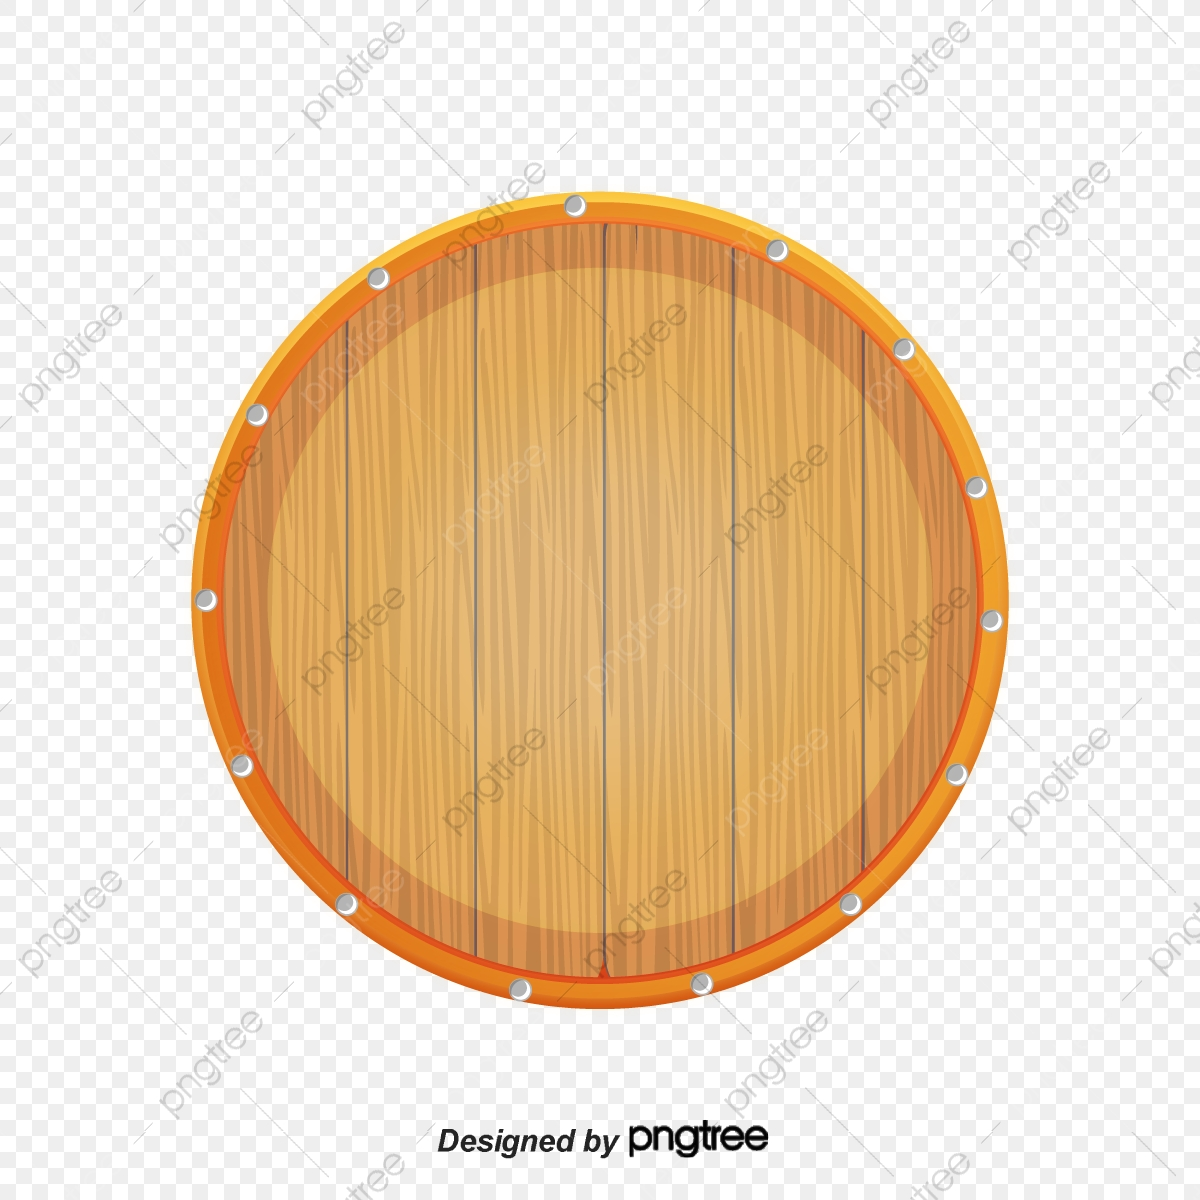 The bottom of bucket. Barrel clipart wood barrel